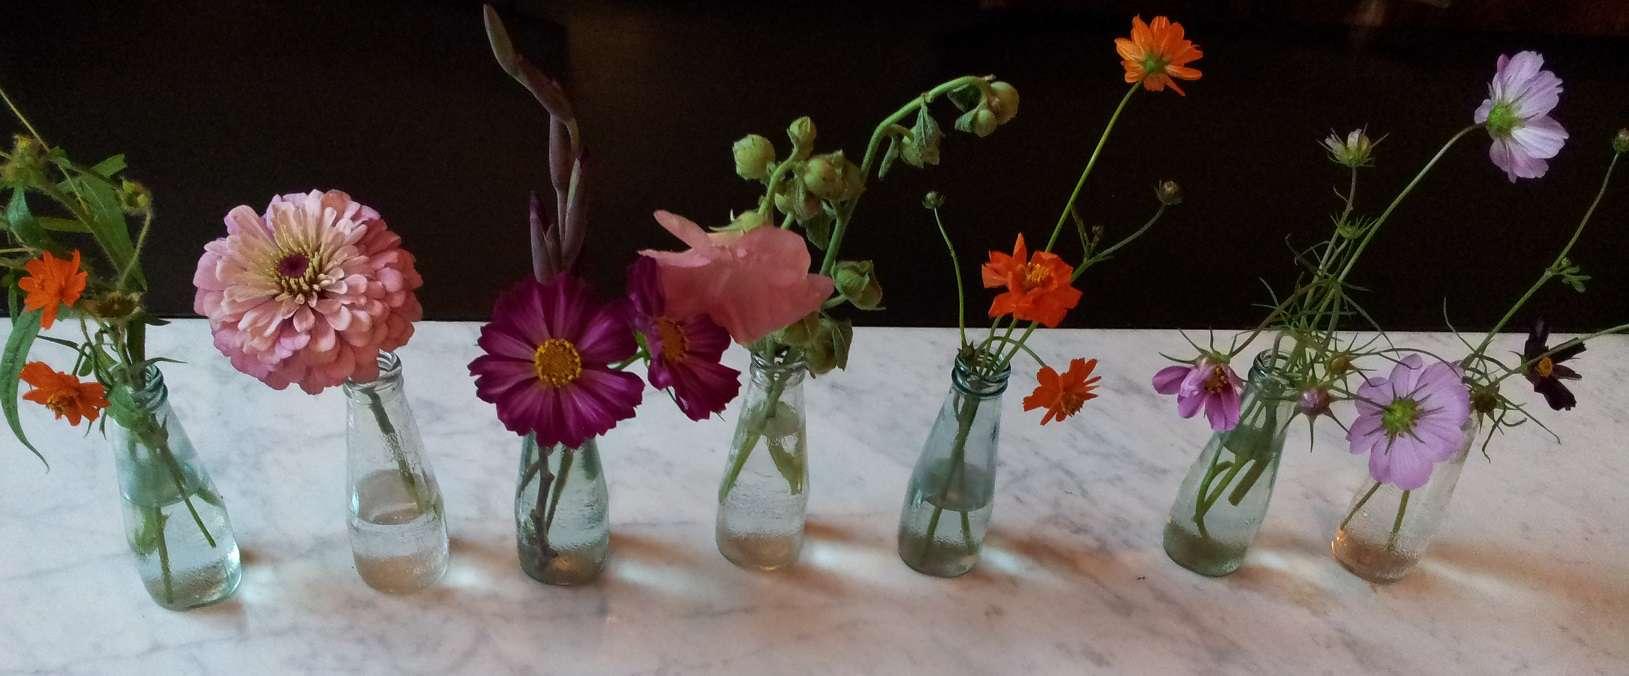 hobby bloemetjes klein